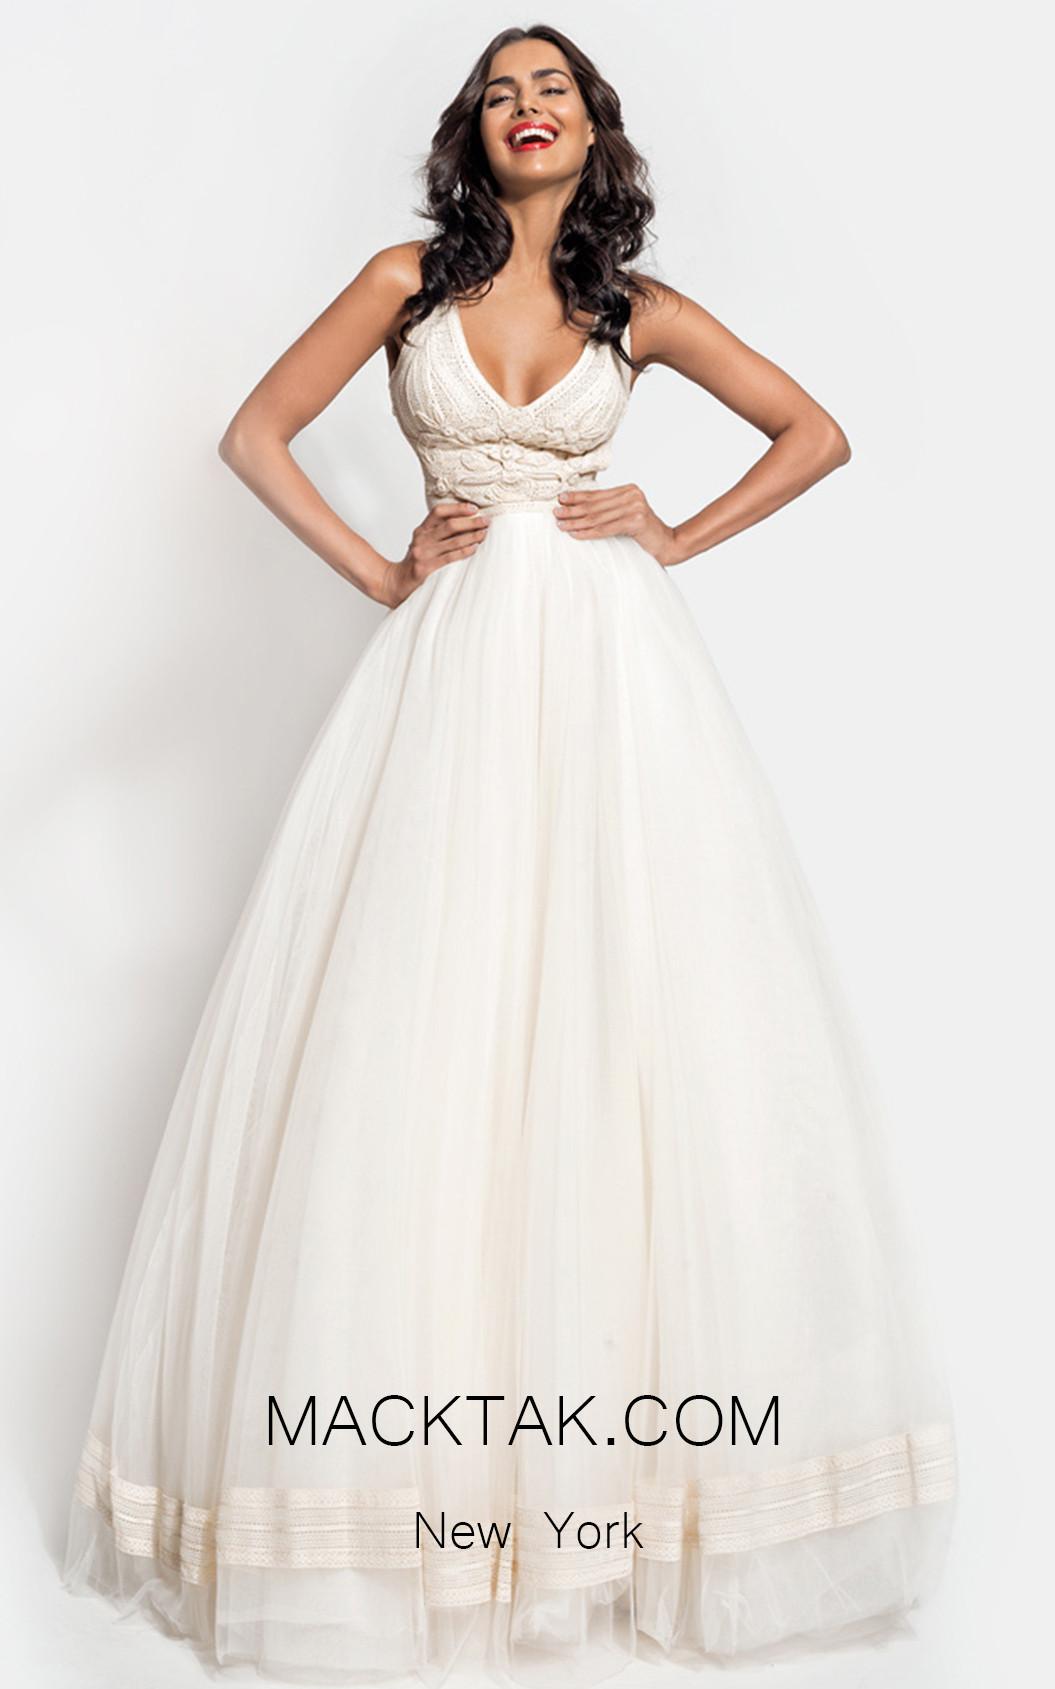 Zolotas Atelier Maera Front Evening Dress